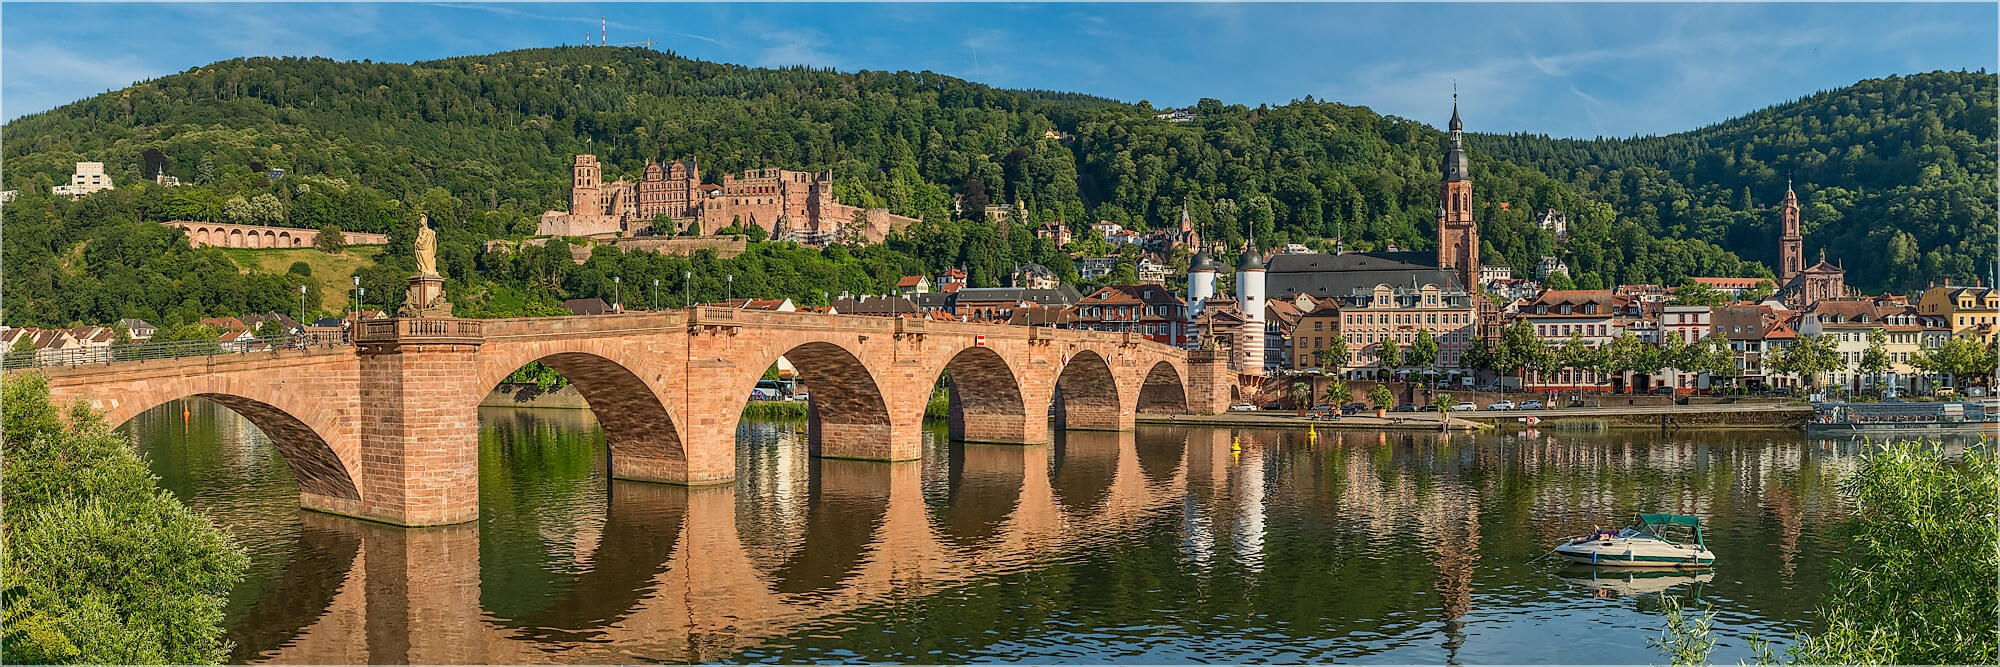 Panoramabild alte Brücke Heidelberg am Nachmittag